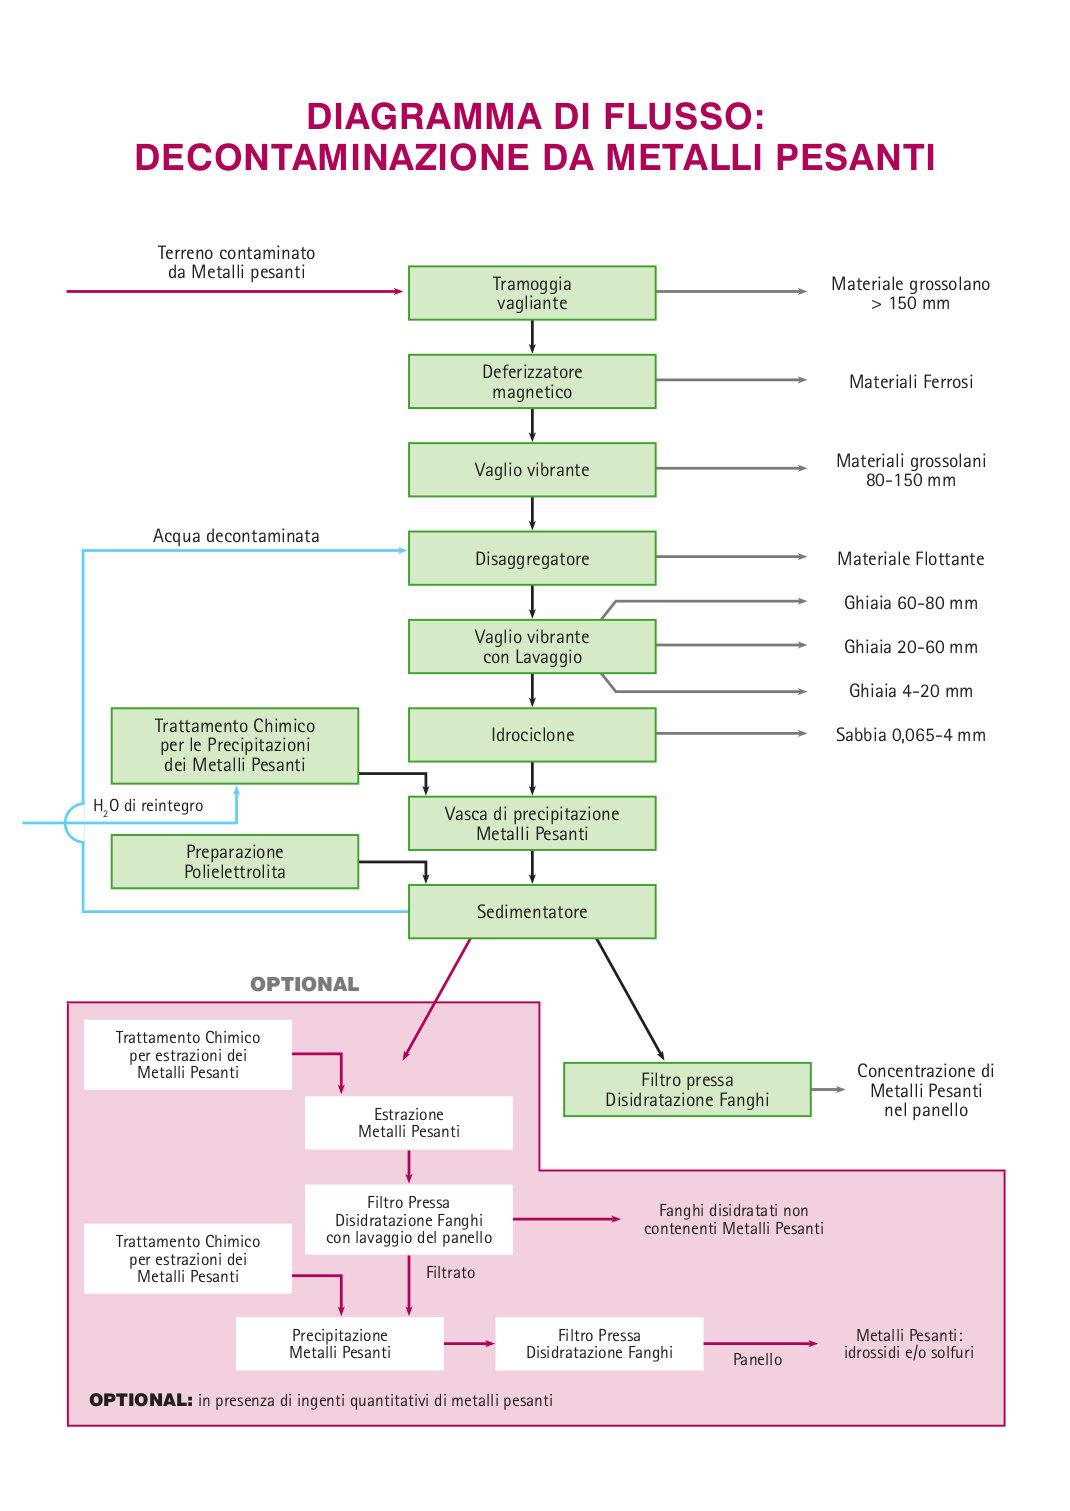 Diagramma decontaminazione da metalli pesanti diemme Soil Washing Metalli